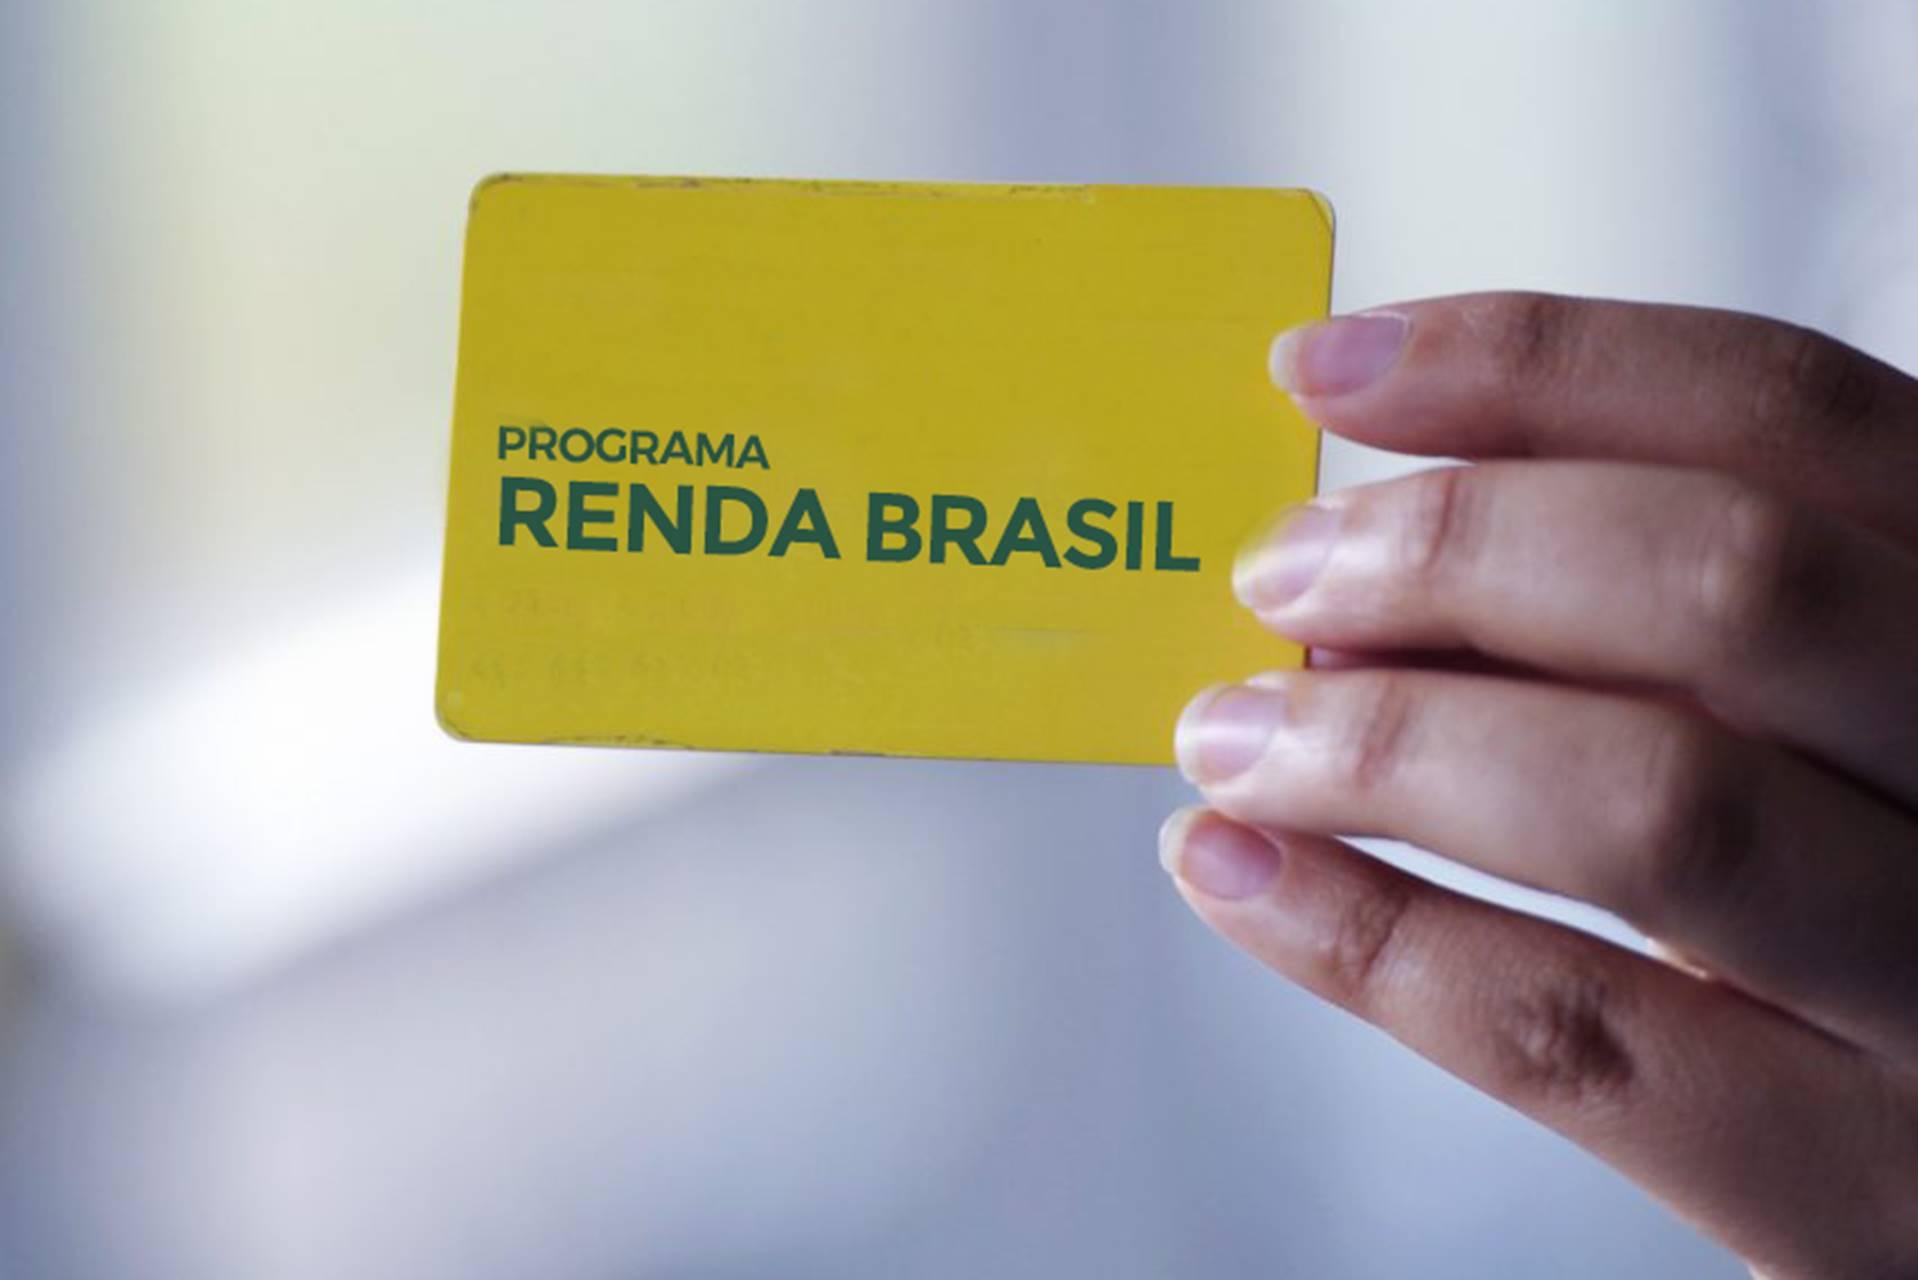 Renda Brasil, conheça o programa que vai substituir o Bolsa Família